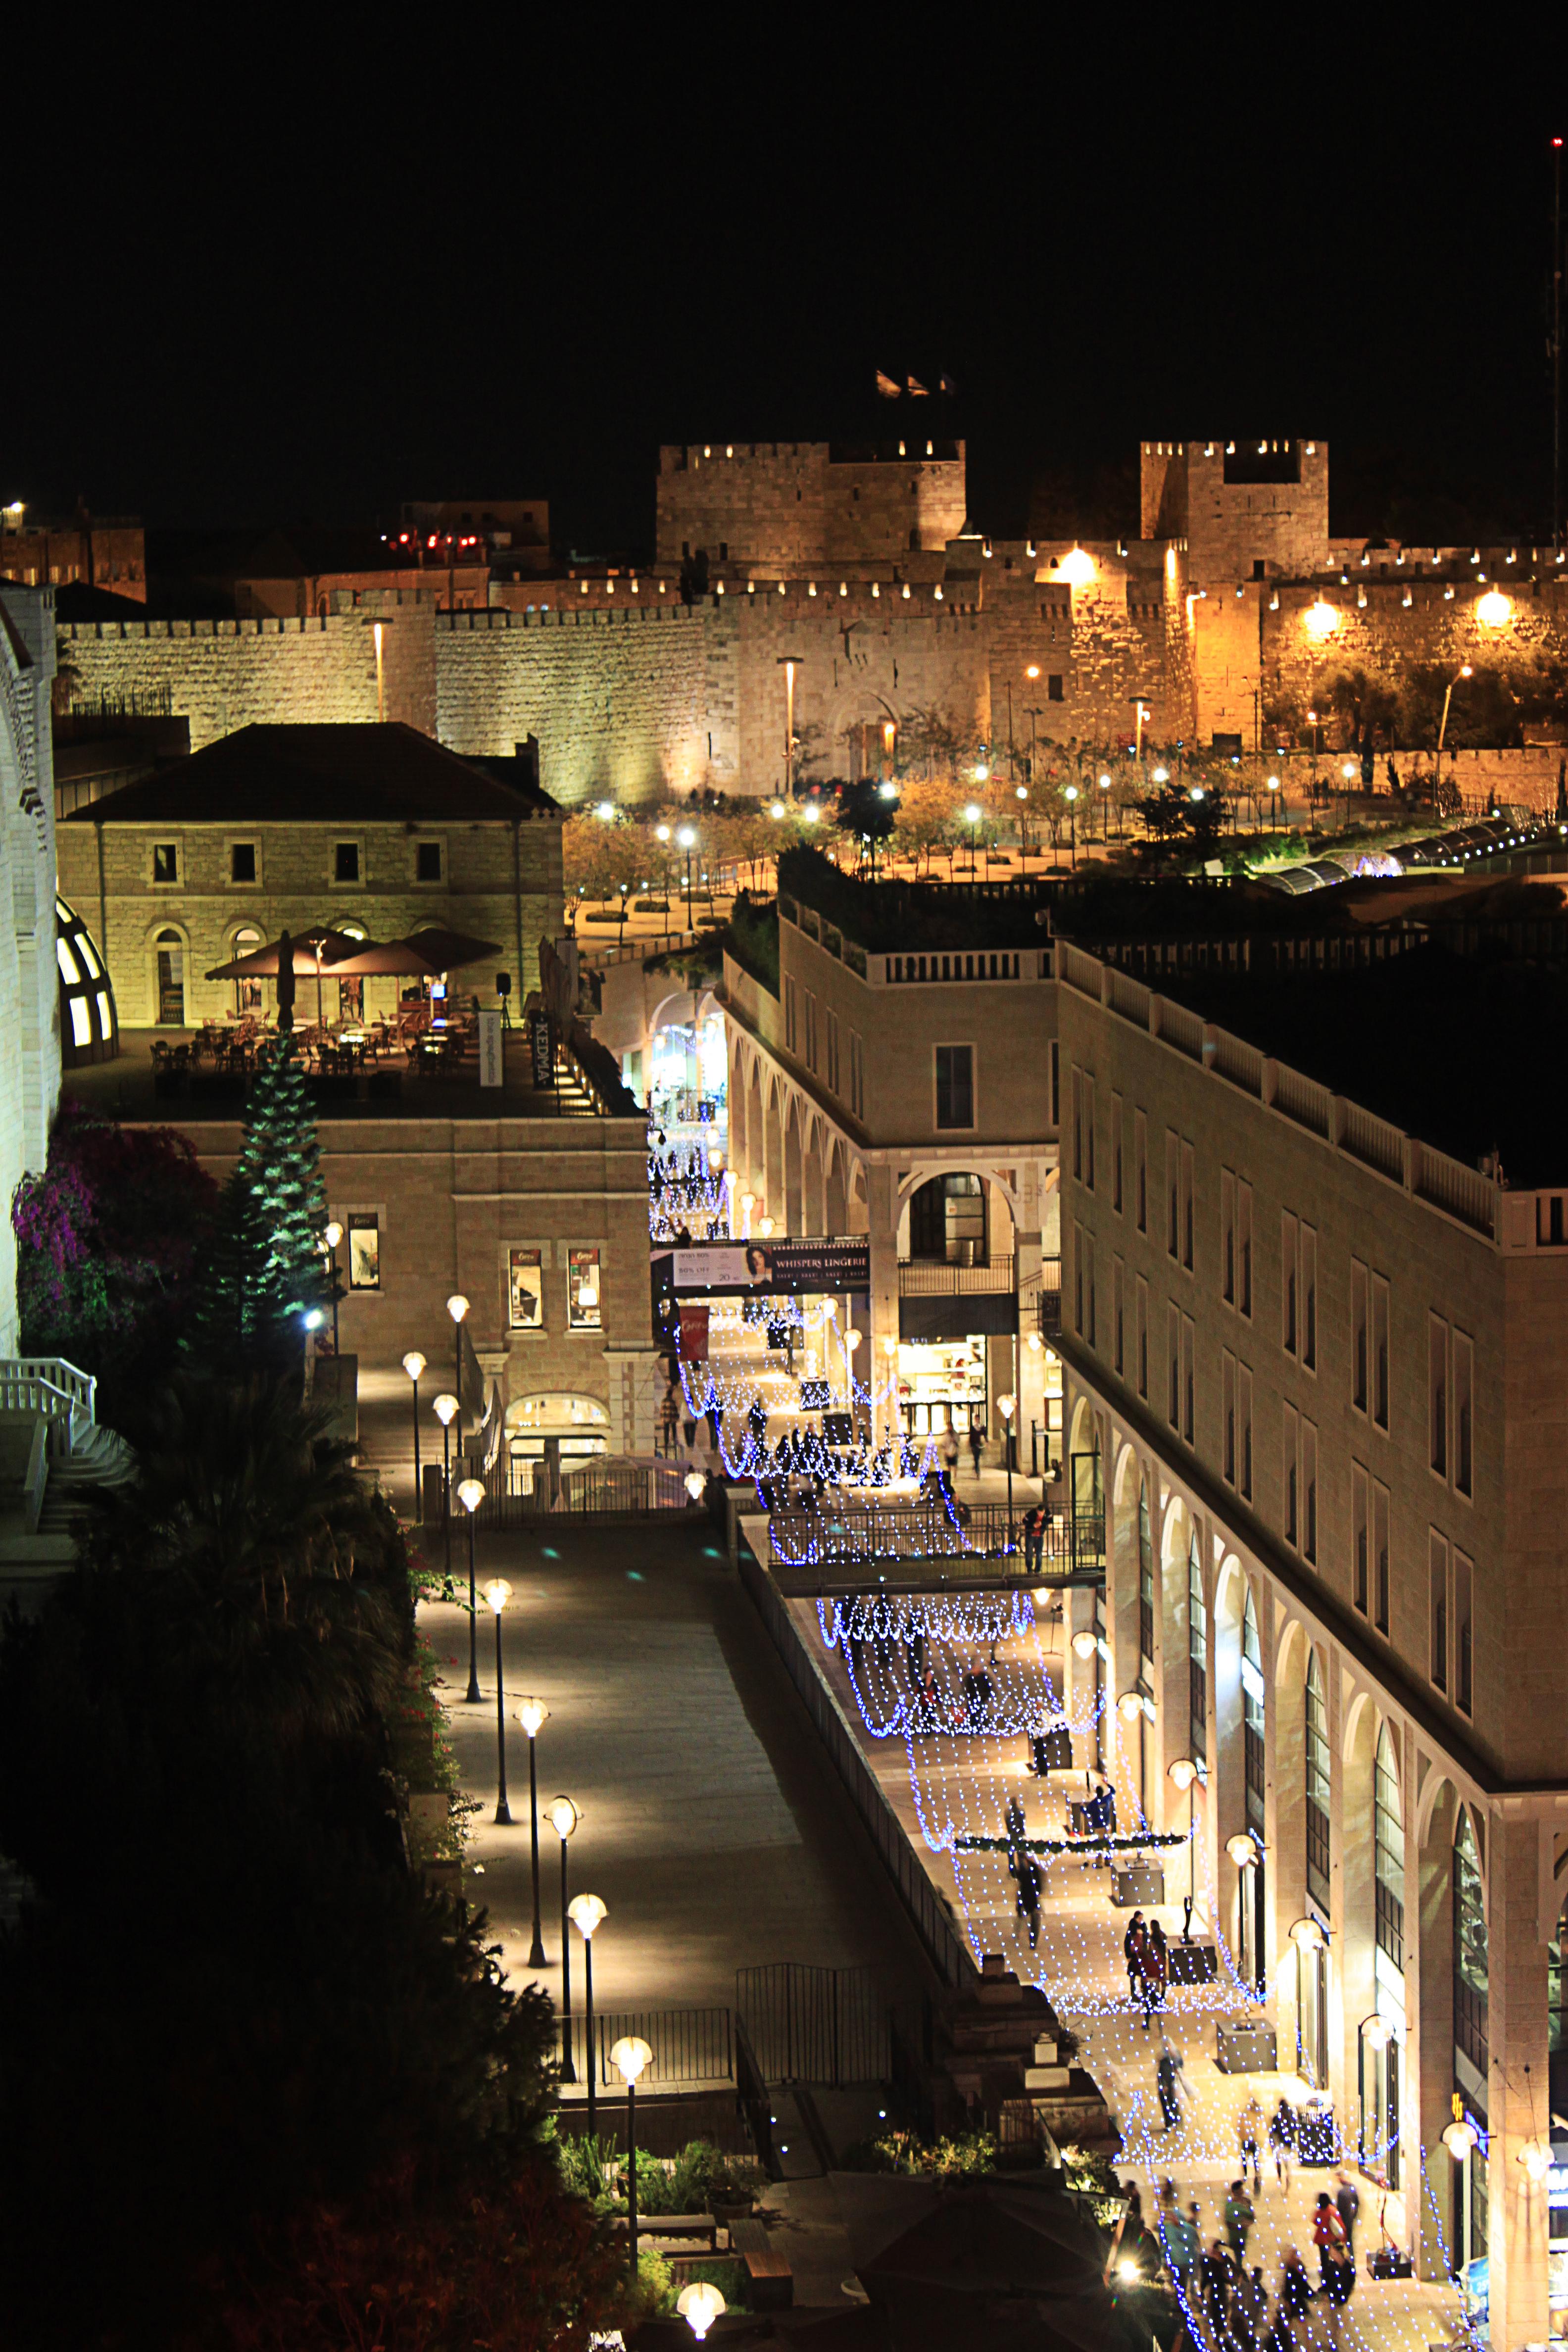 File:Old city walls and mamilla ave. at night - as seen ...